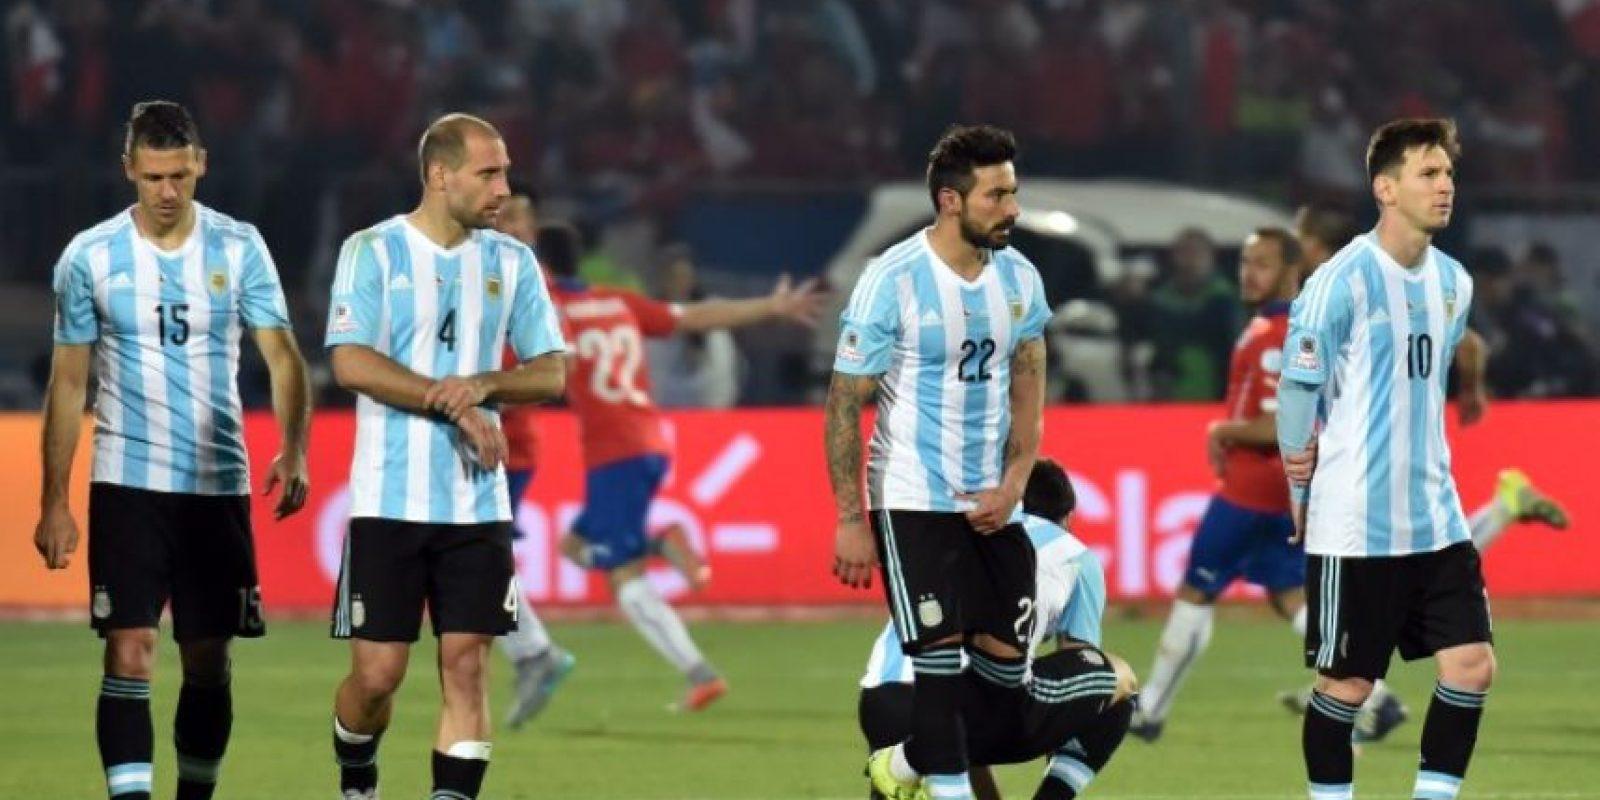 Argentina querrá cobrarse revancha de la final que le ganó Chile por penales en la Copa América 2015 Foto:Getty Images